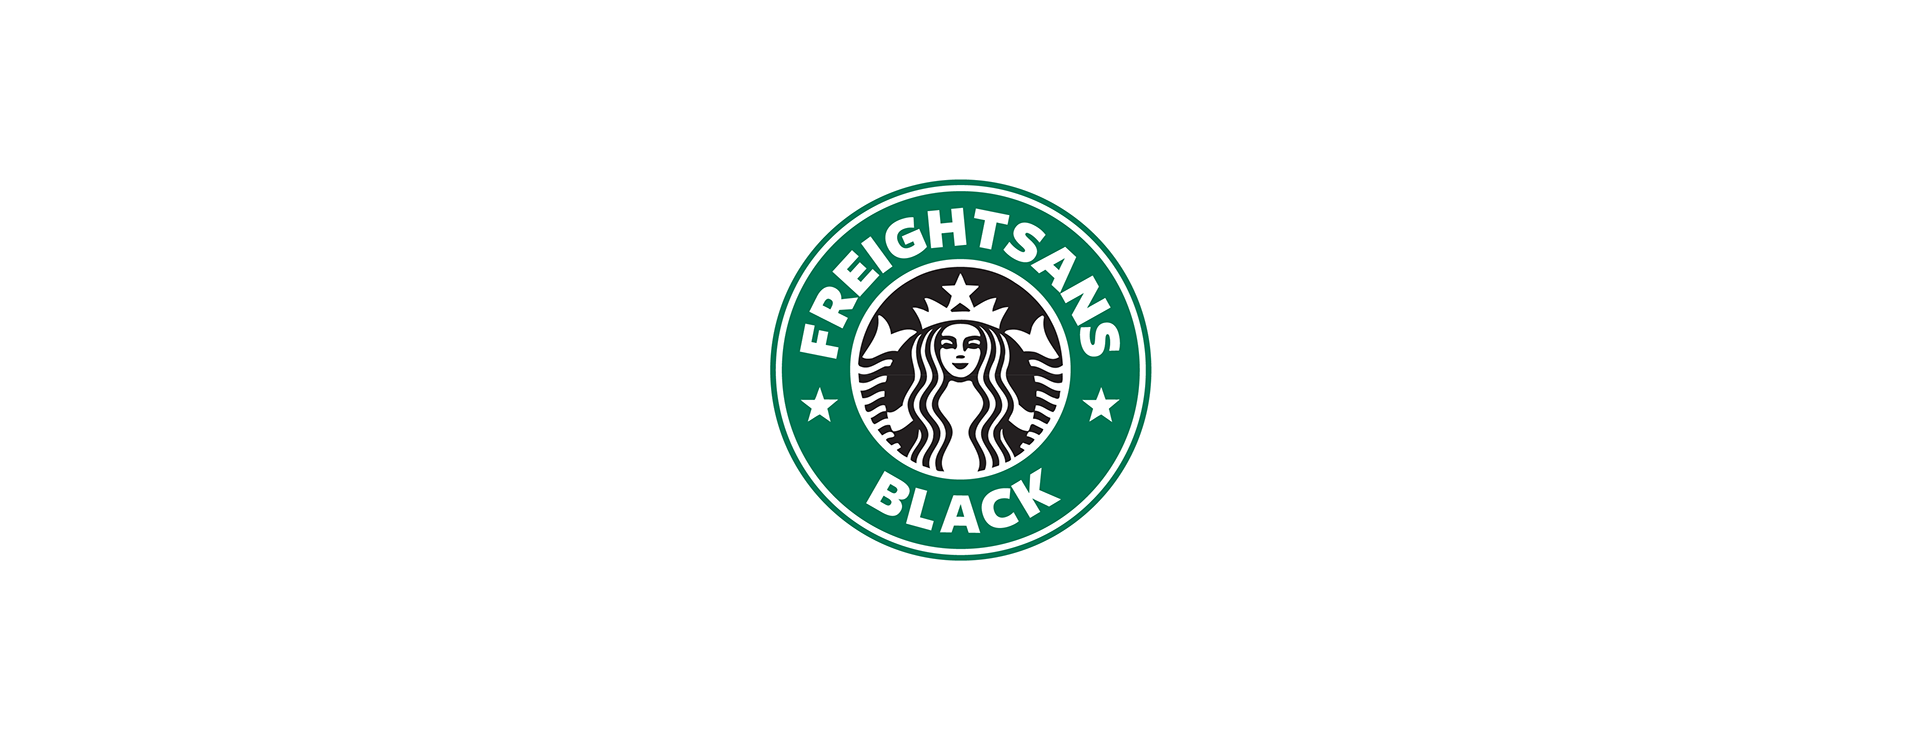 logo-fonts-design-brands-creative-6